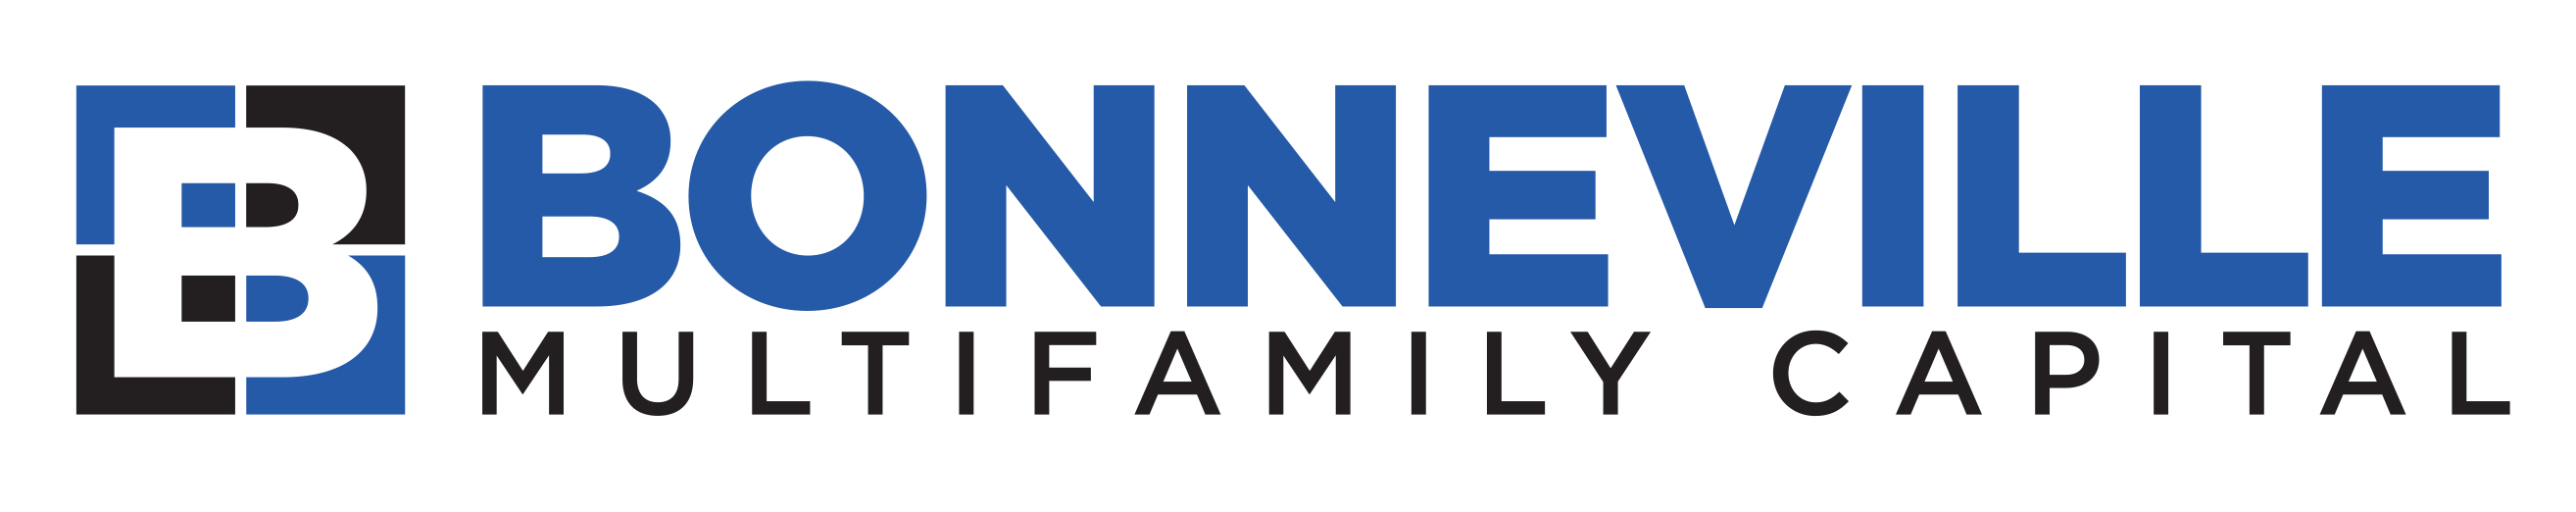 Bonneville_MFC_logo_293_black